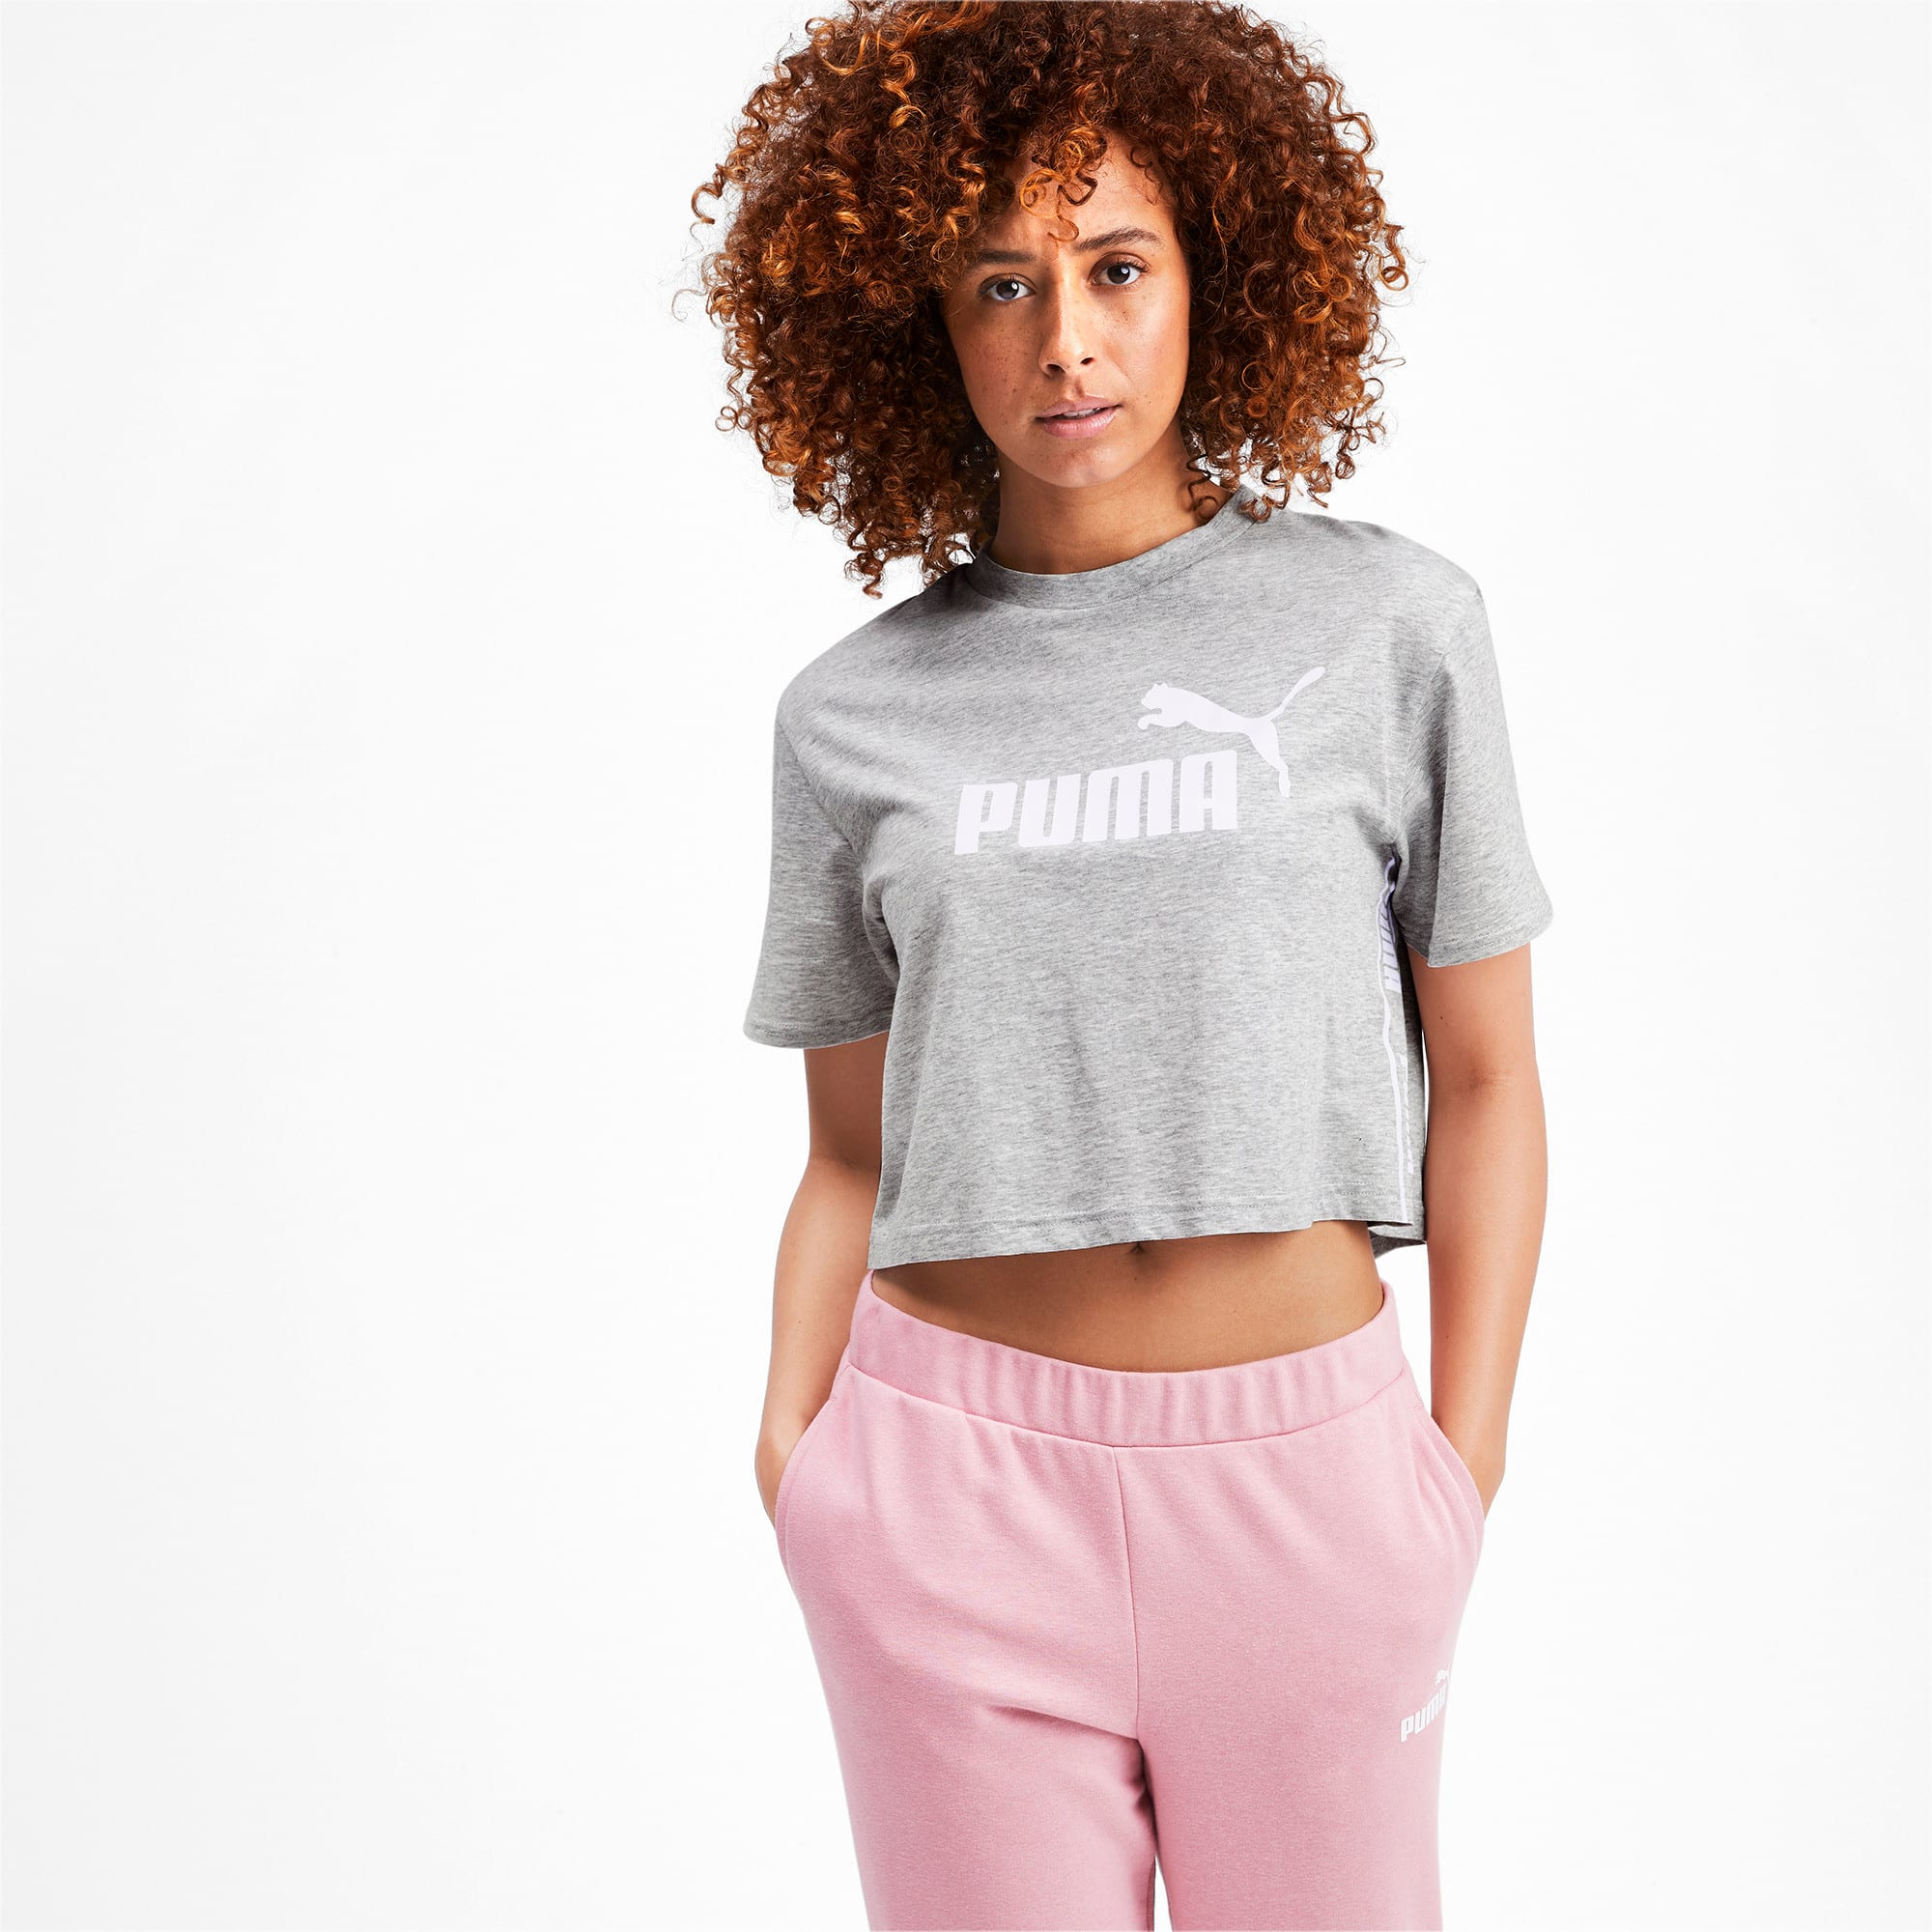 Miniatura 2 de Camiseta corta Amplified para mujer, Light Gray Heather, mediano